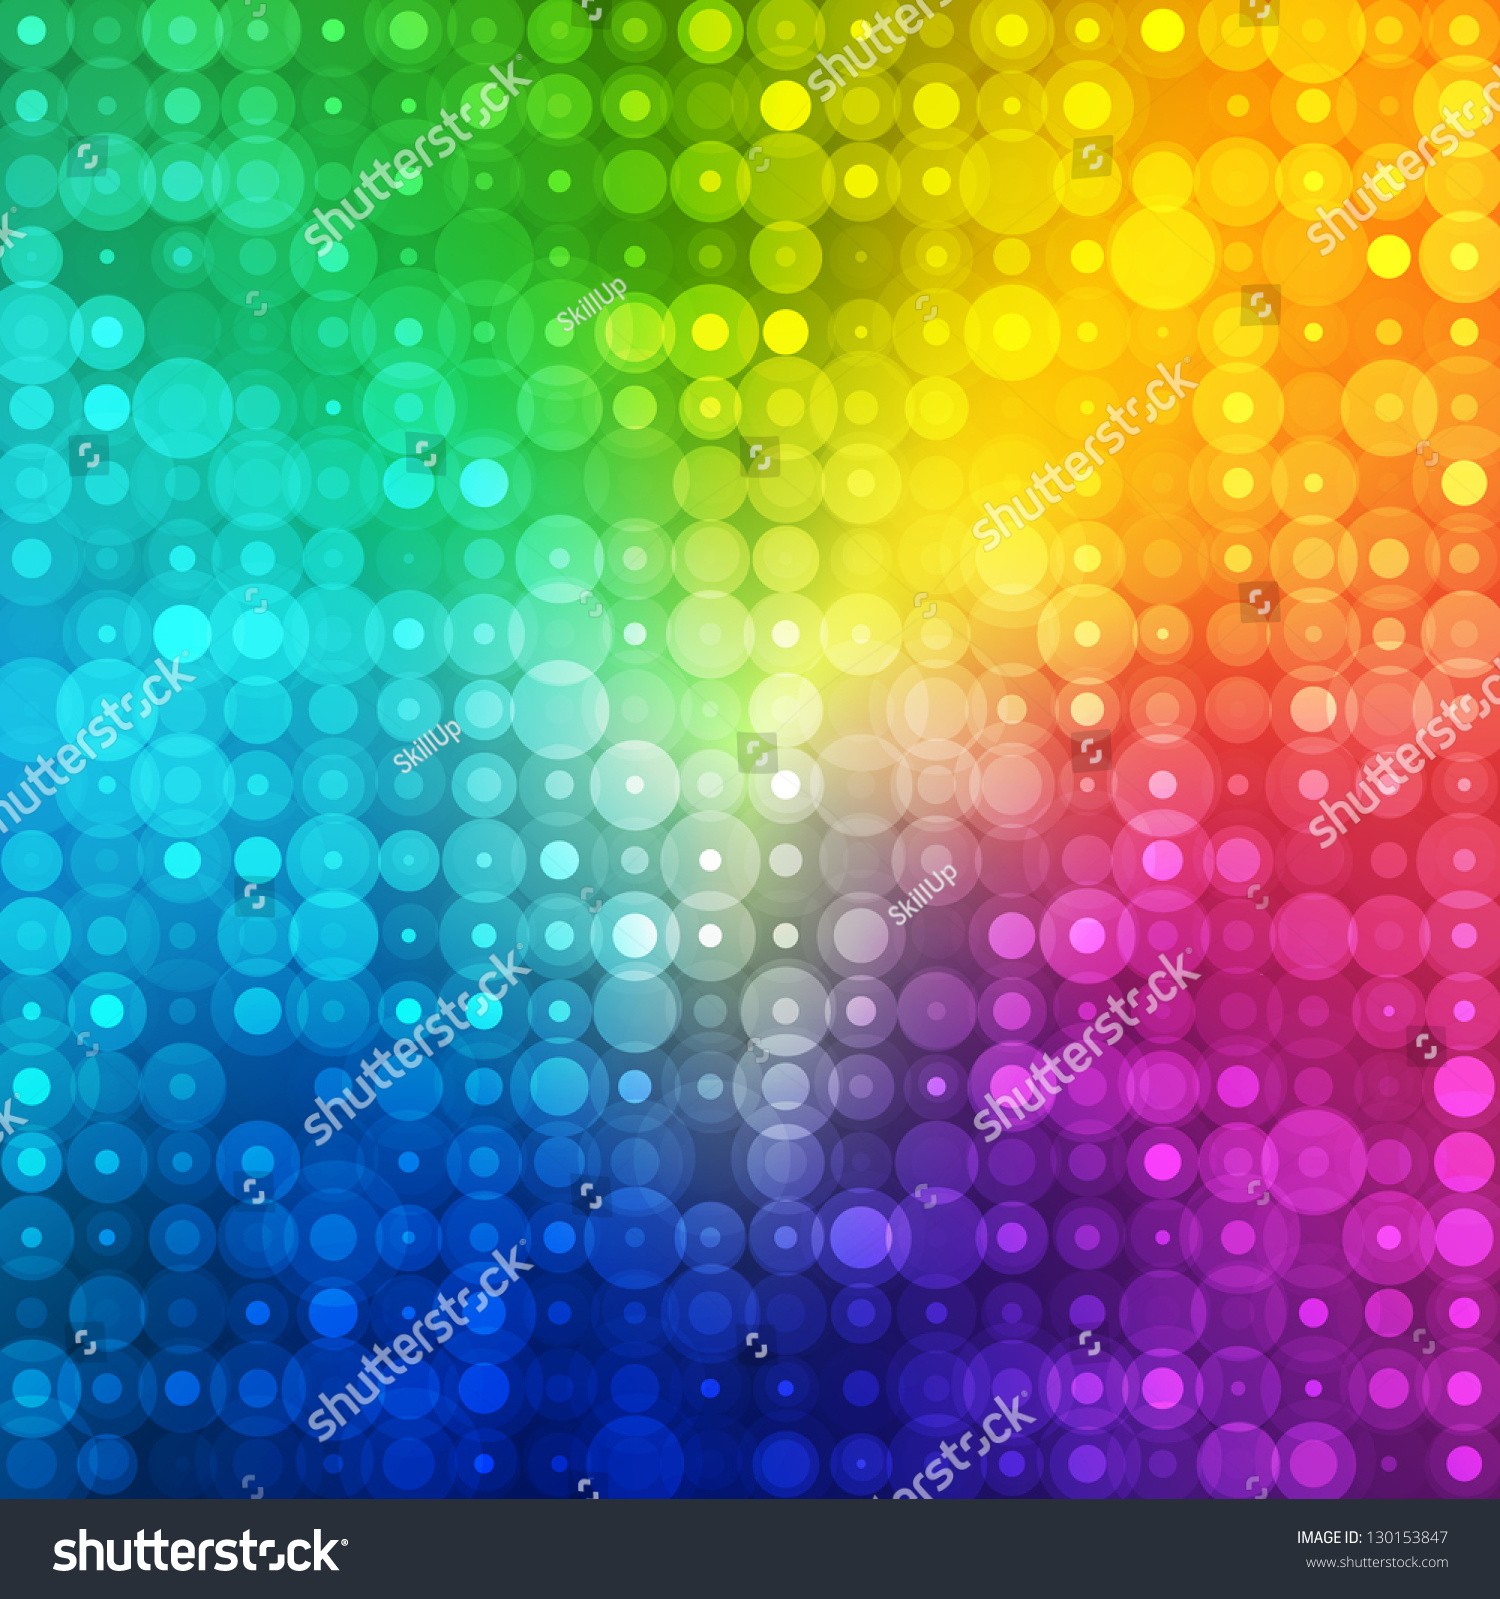 Yellow Background Online Image & Pho...